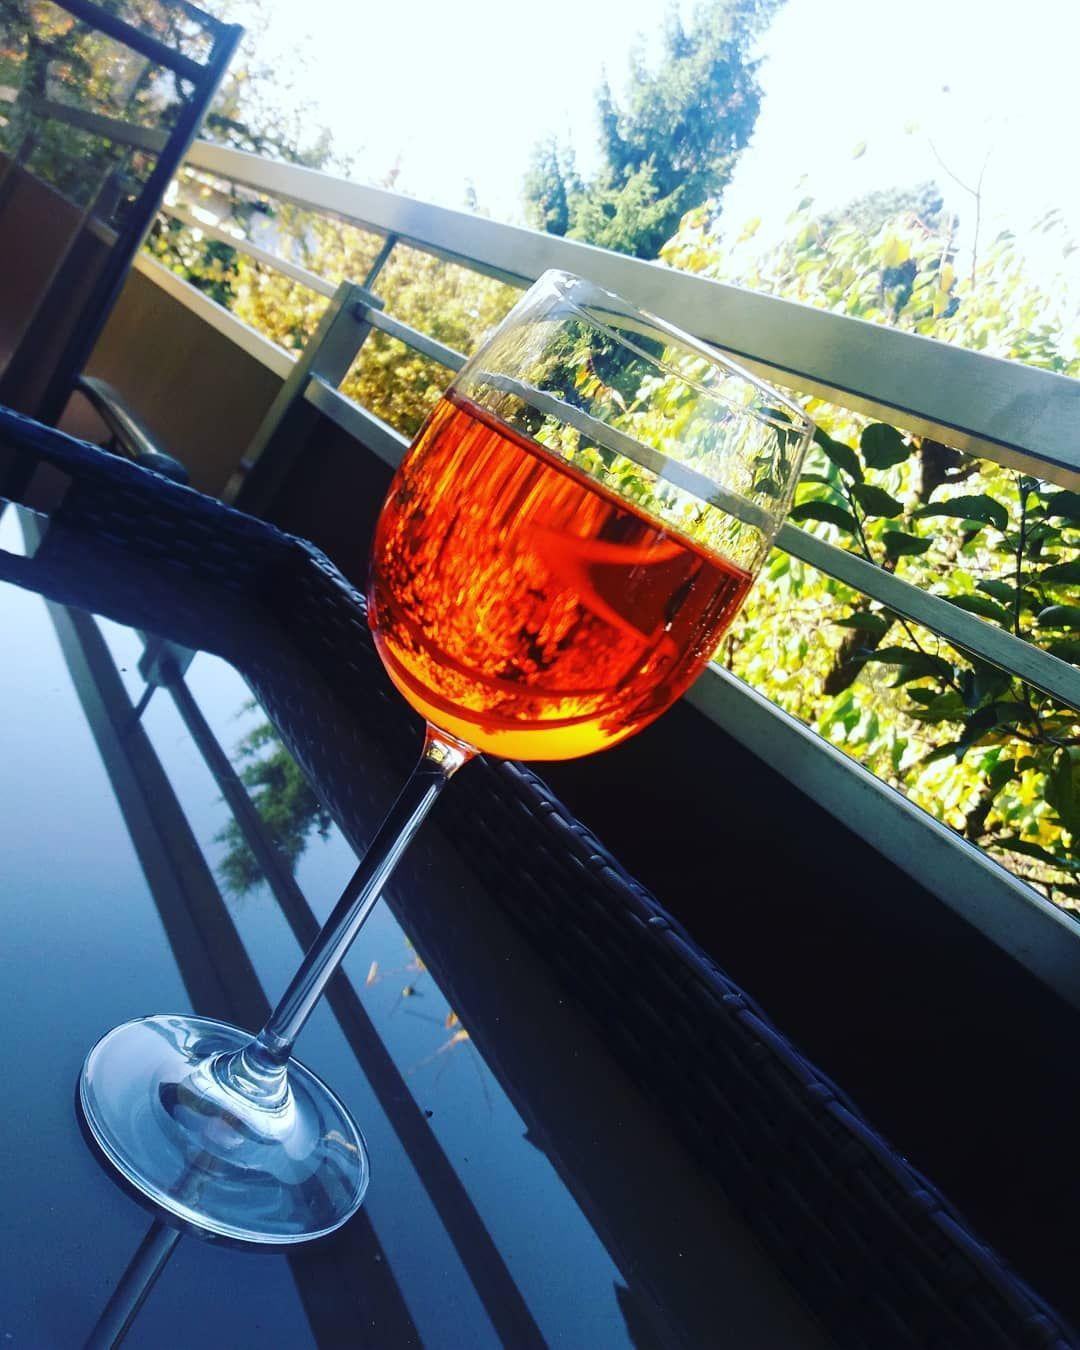 Feiertag Aperoltime Aperolspritz Relax Autumnvibes Austria Casa Alcoholic Drinks Alcohol Glass